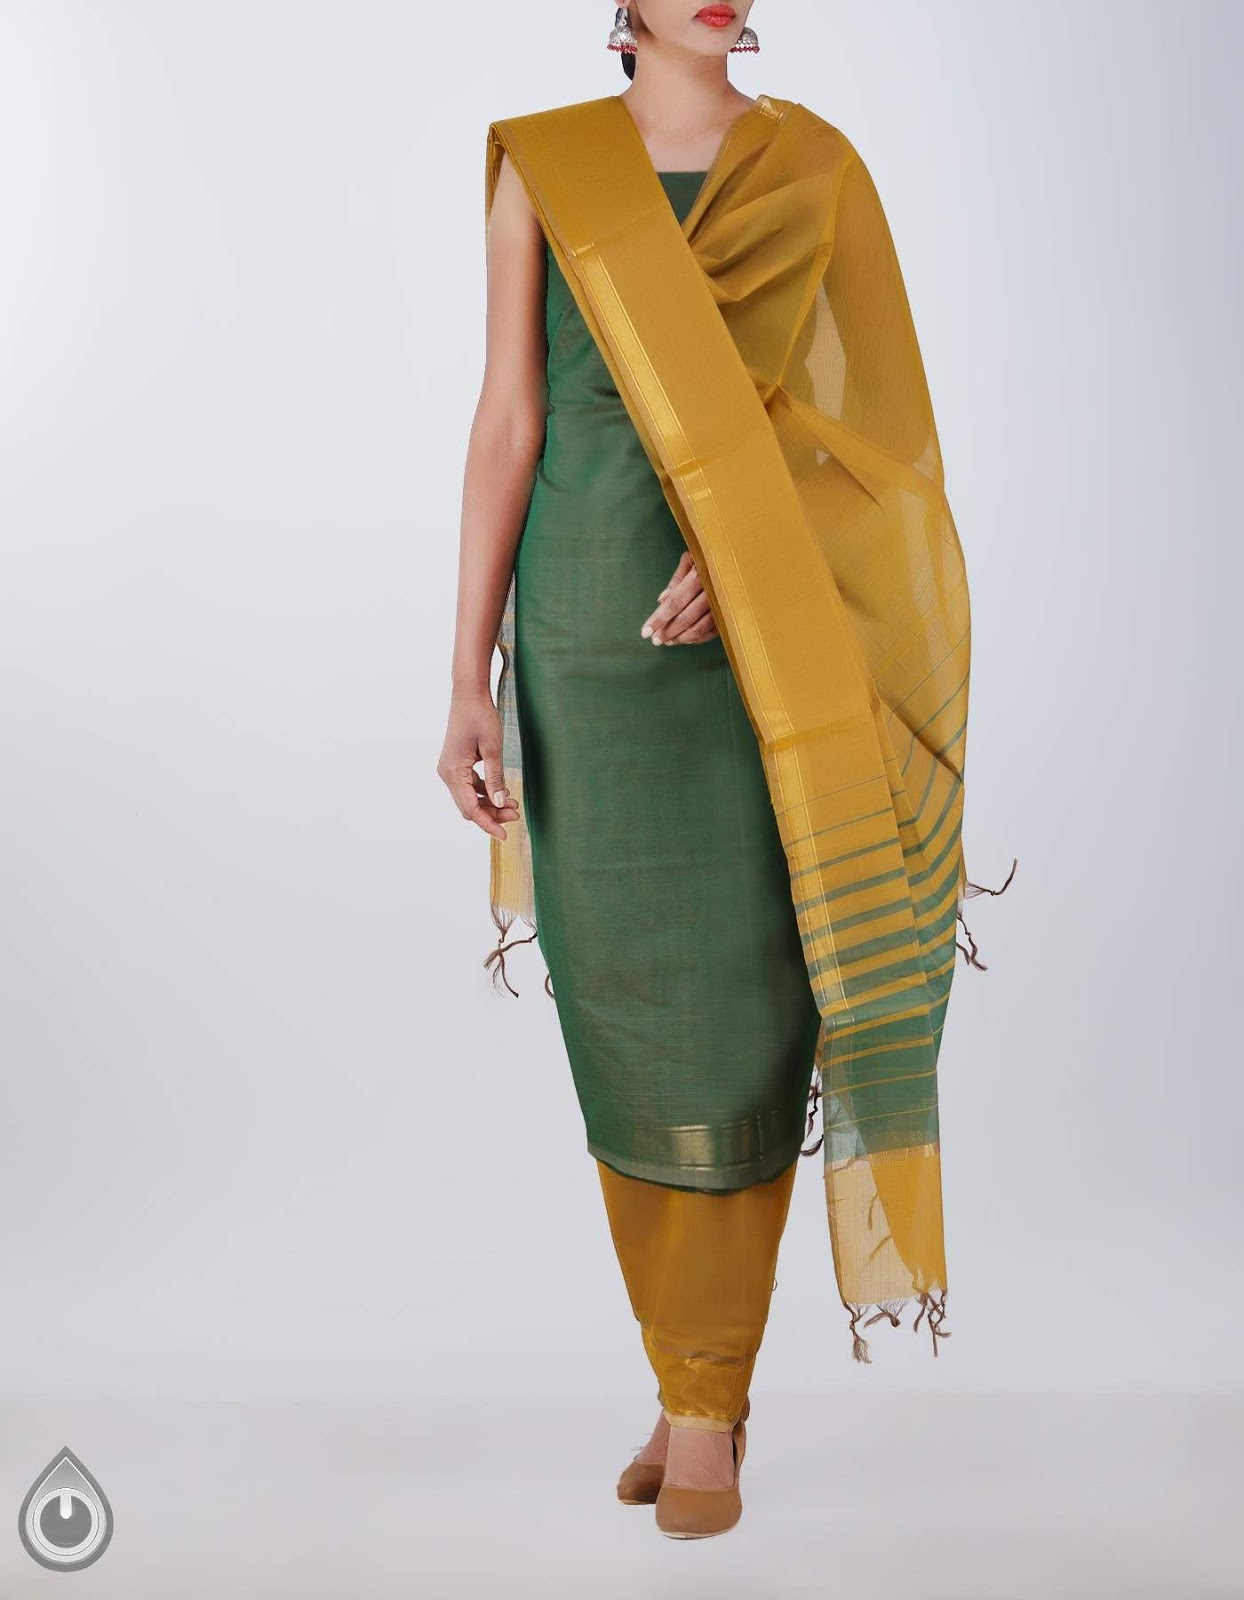 f4bbd05426 ... dupion, tussar silk salwar kameez, organza, crepe silk salwar kameez,  ghicha, jute, designer salwar kameez and other fabric varieties at  attractive ...